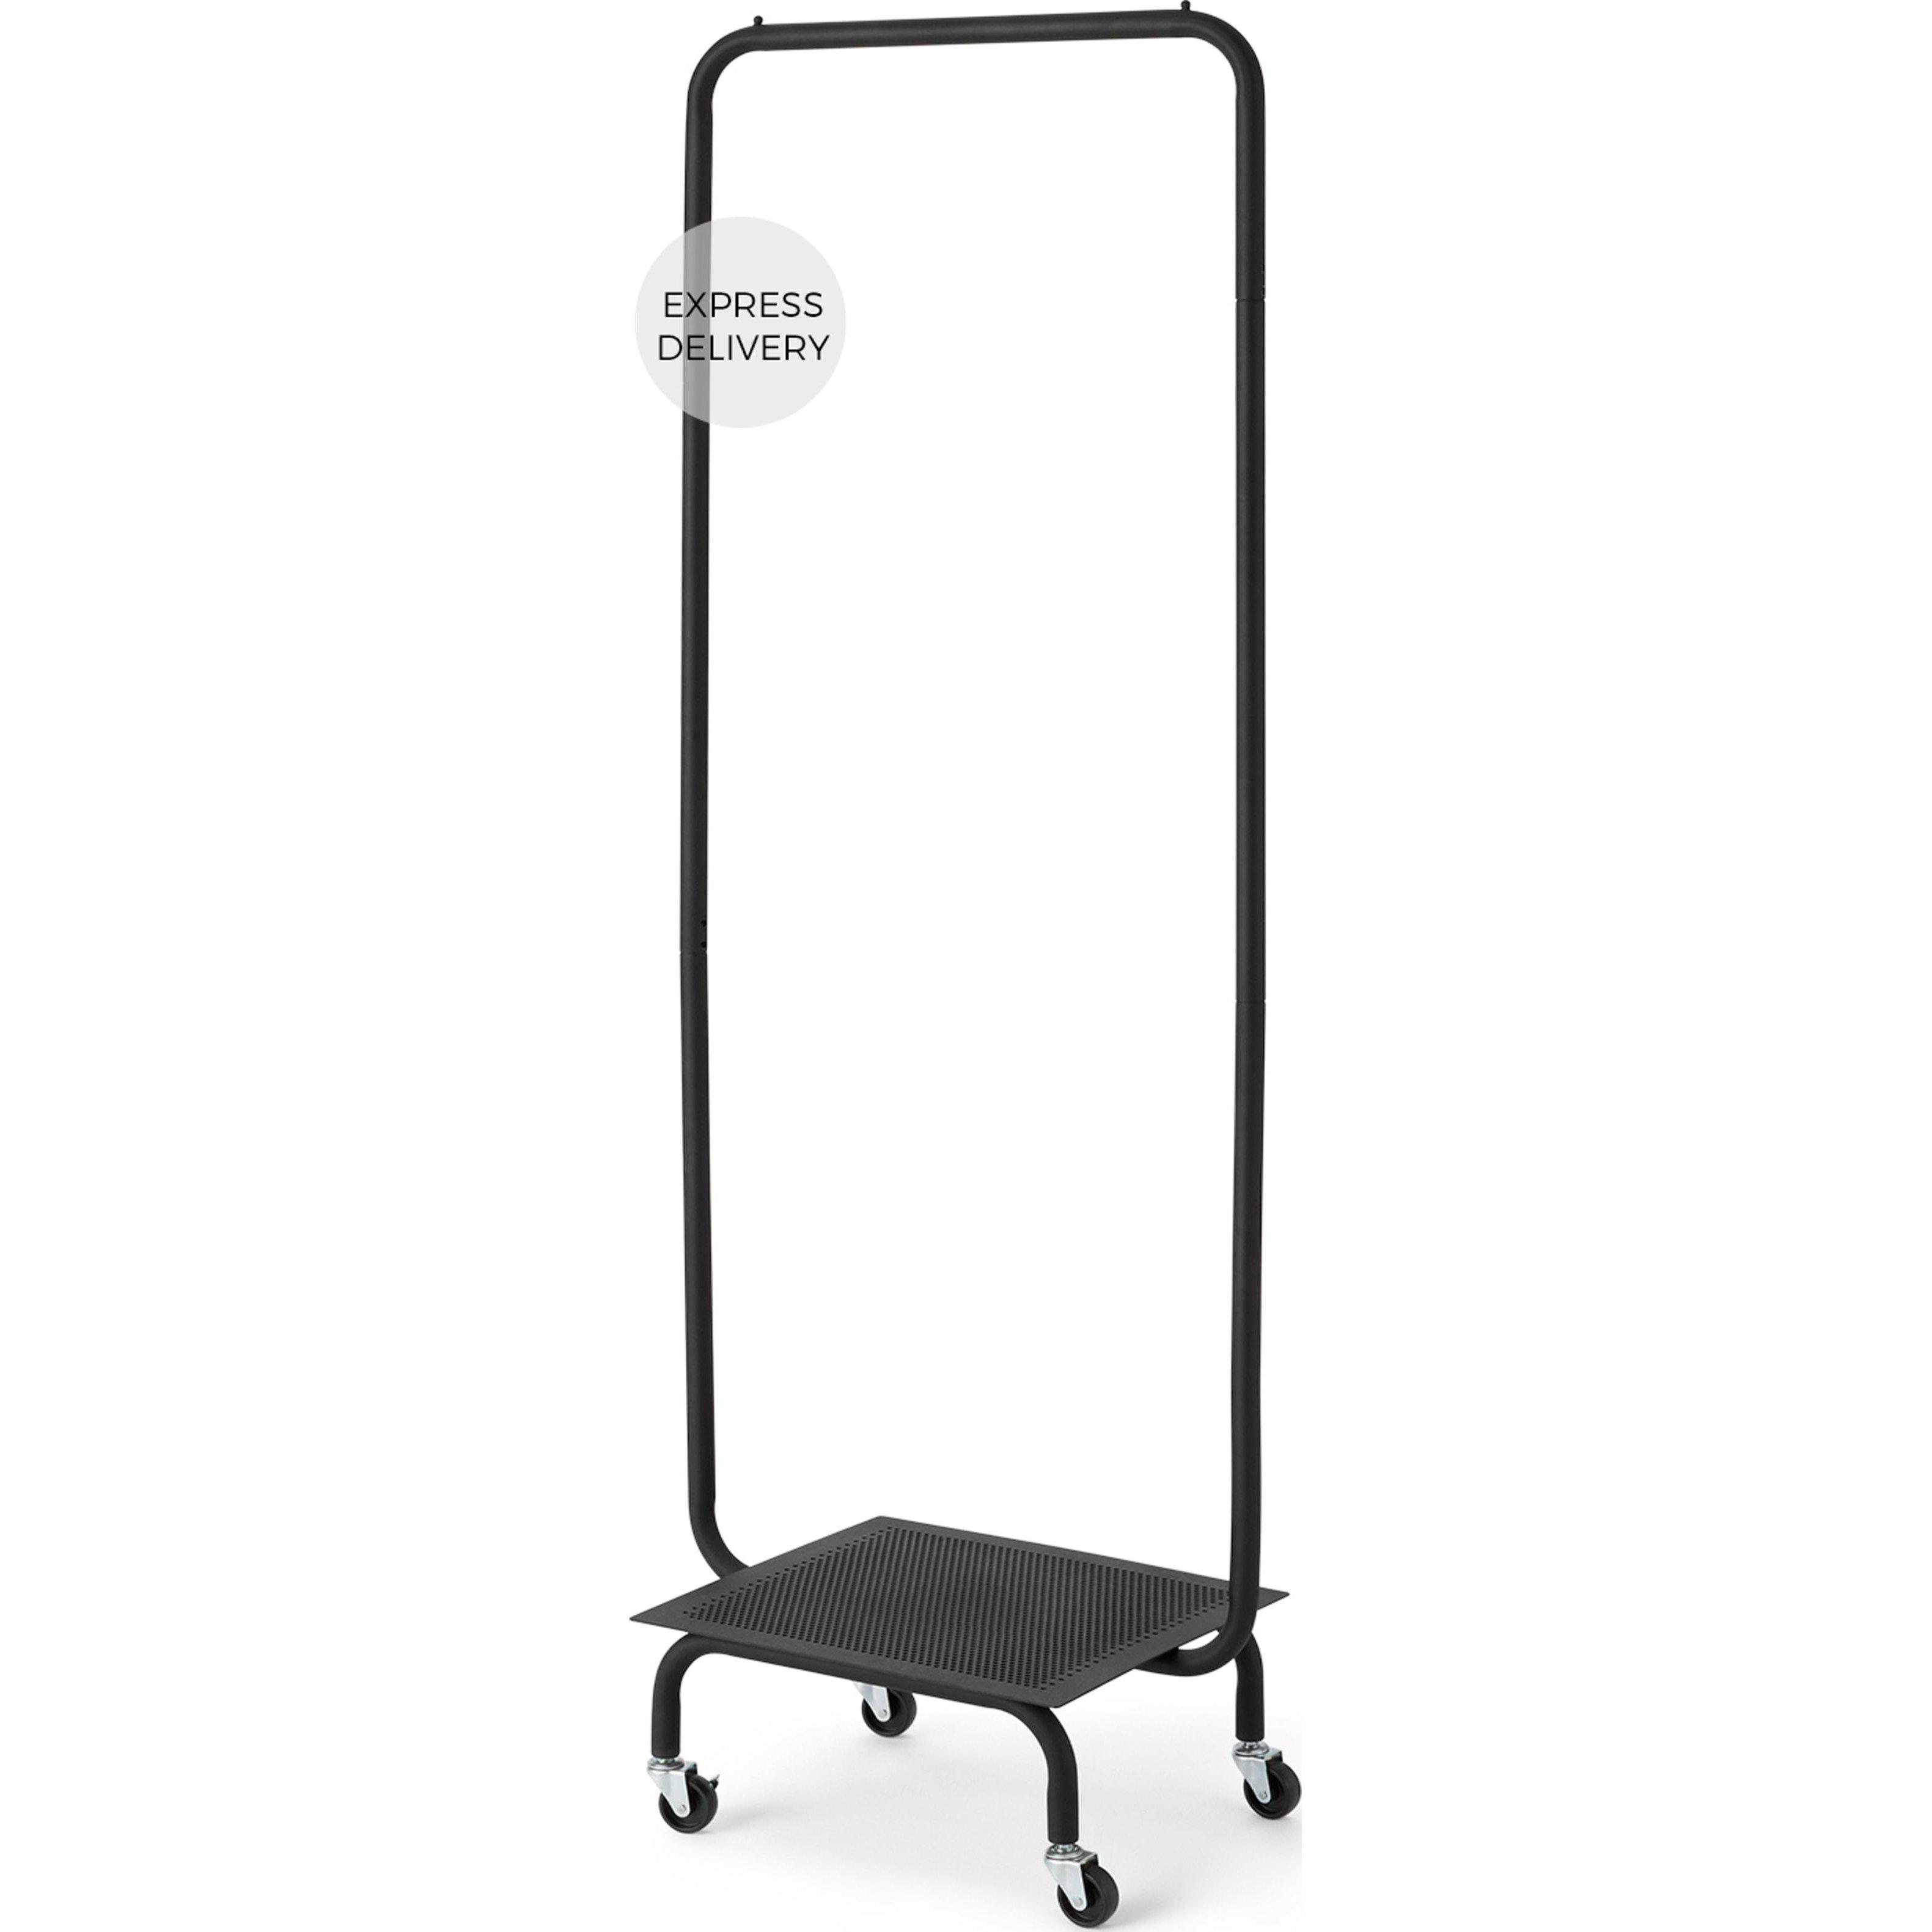 image-Kennedi Perforated Metal Garment & Storage Rack, Black